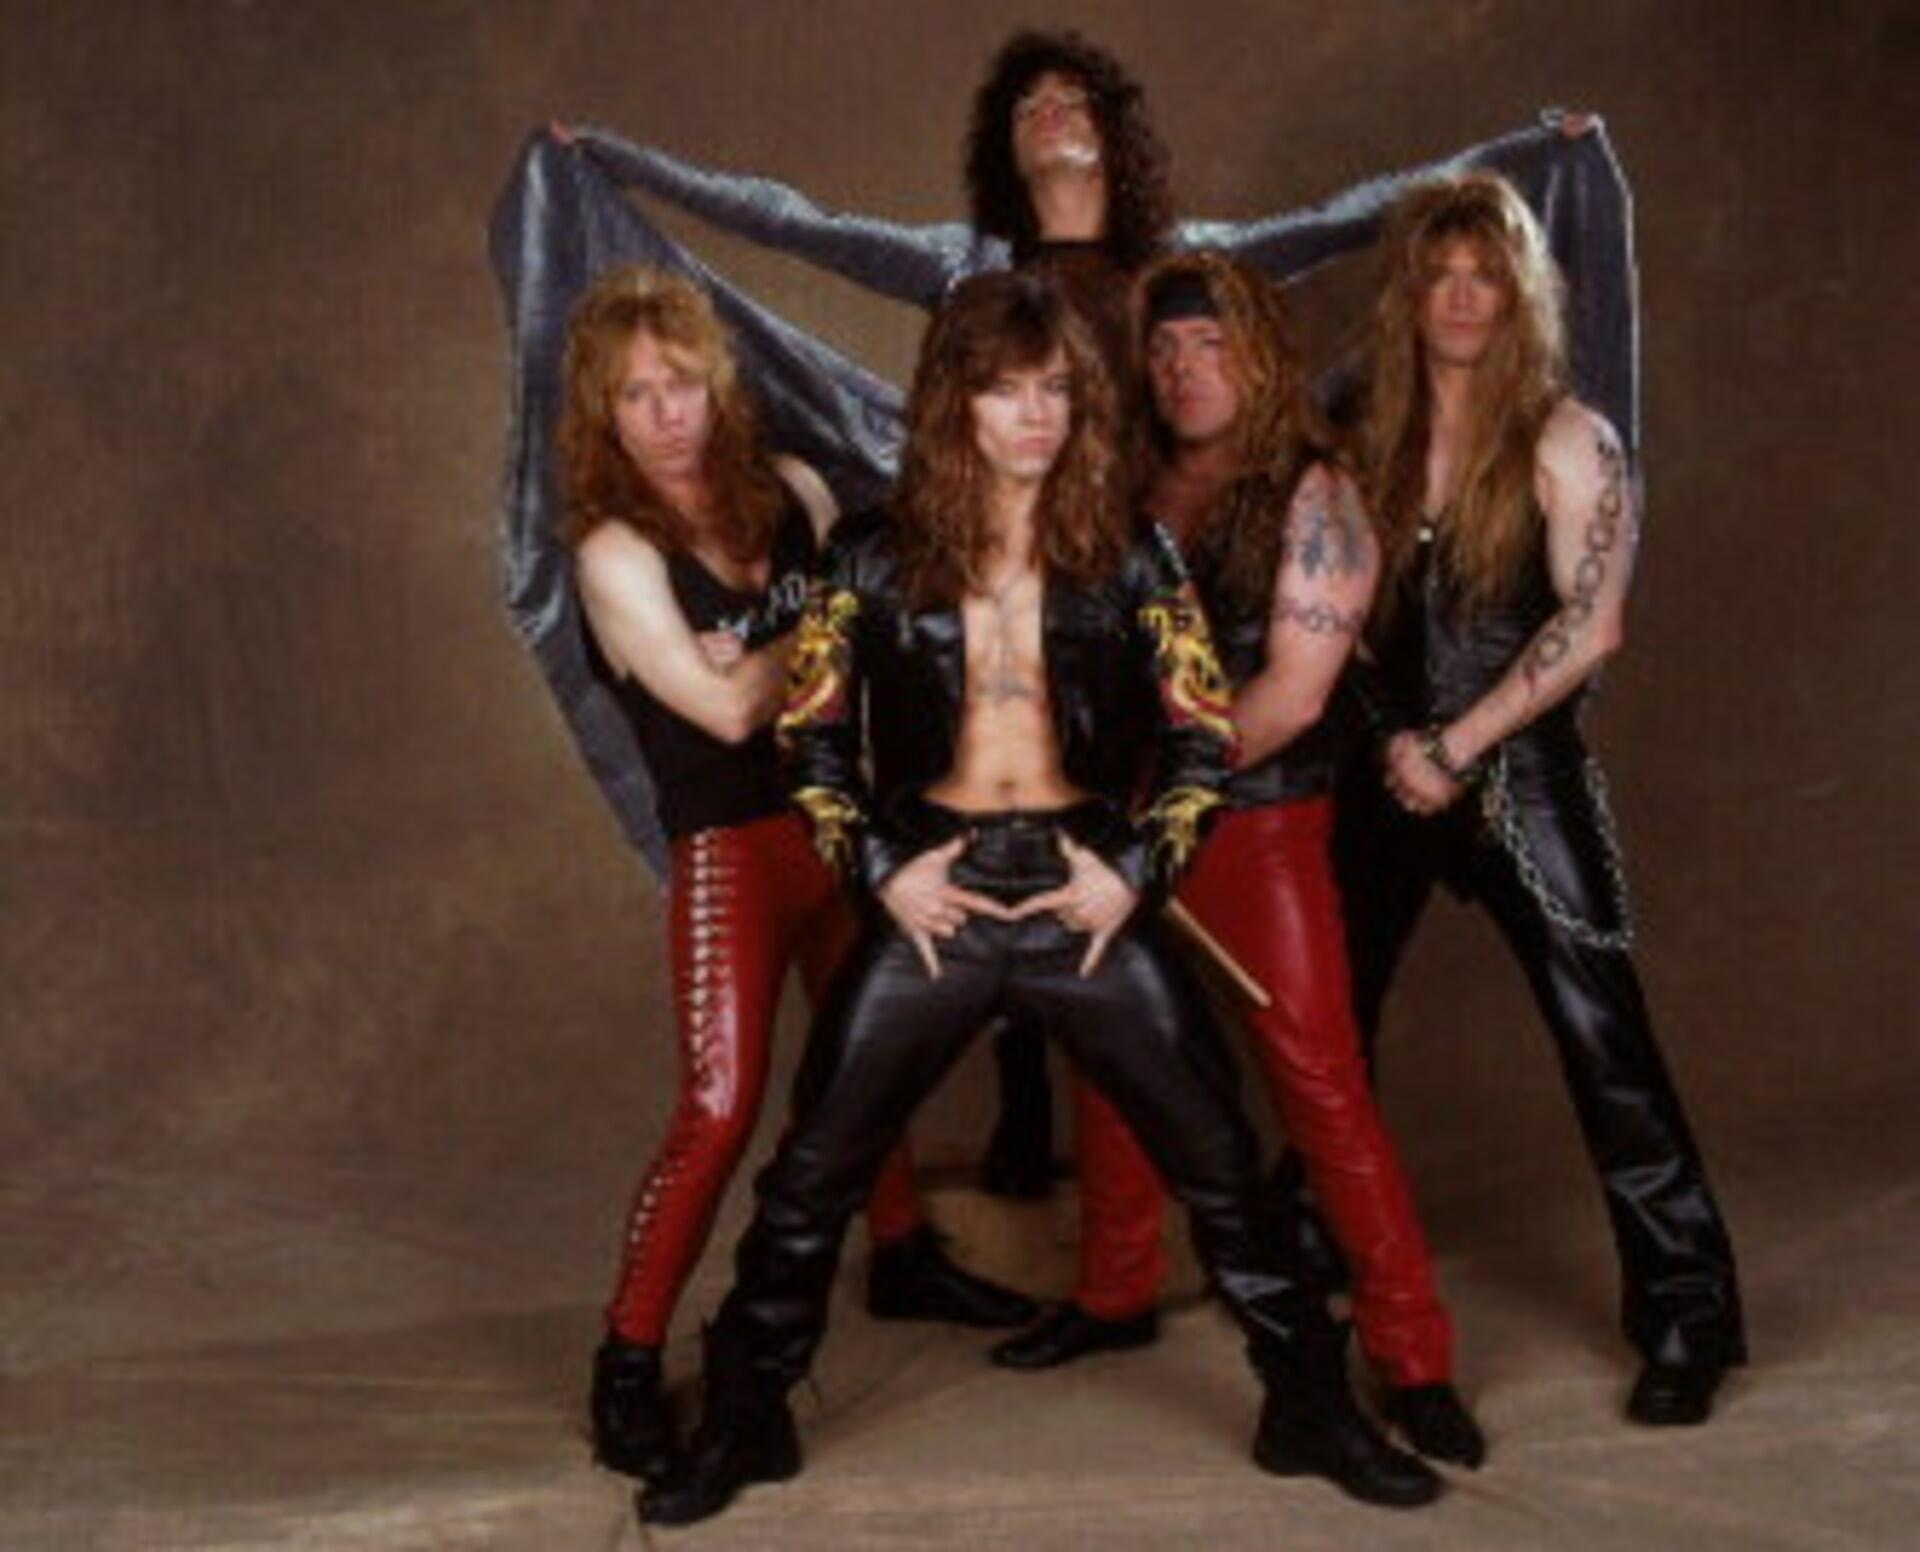 Rock Star - Image 9